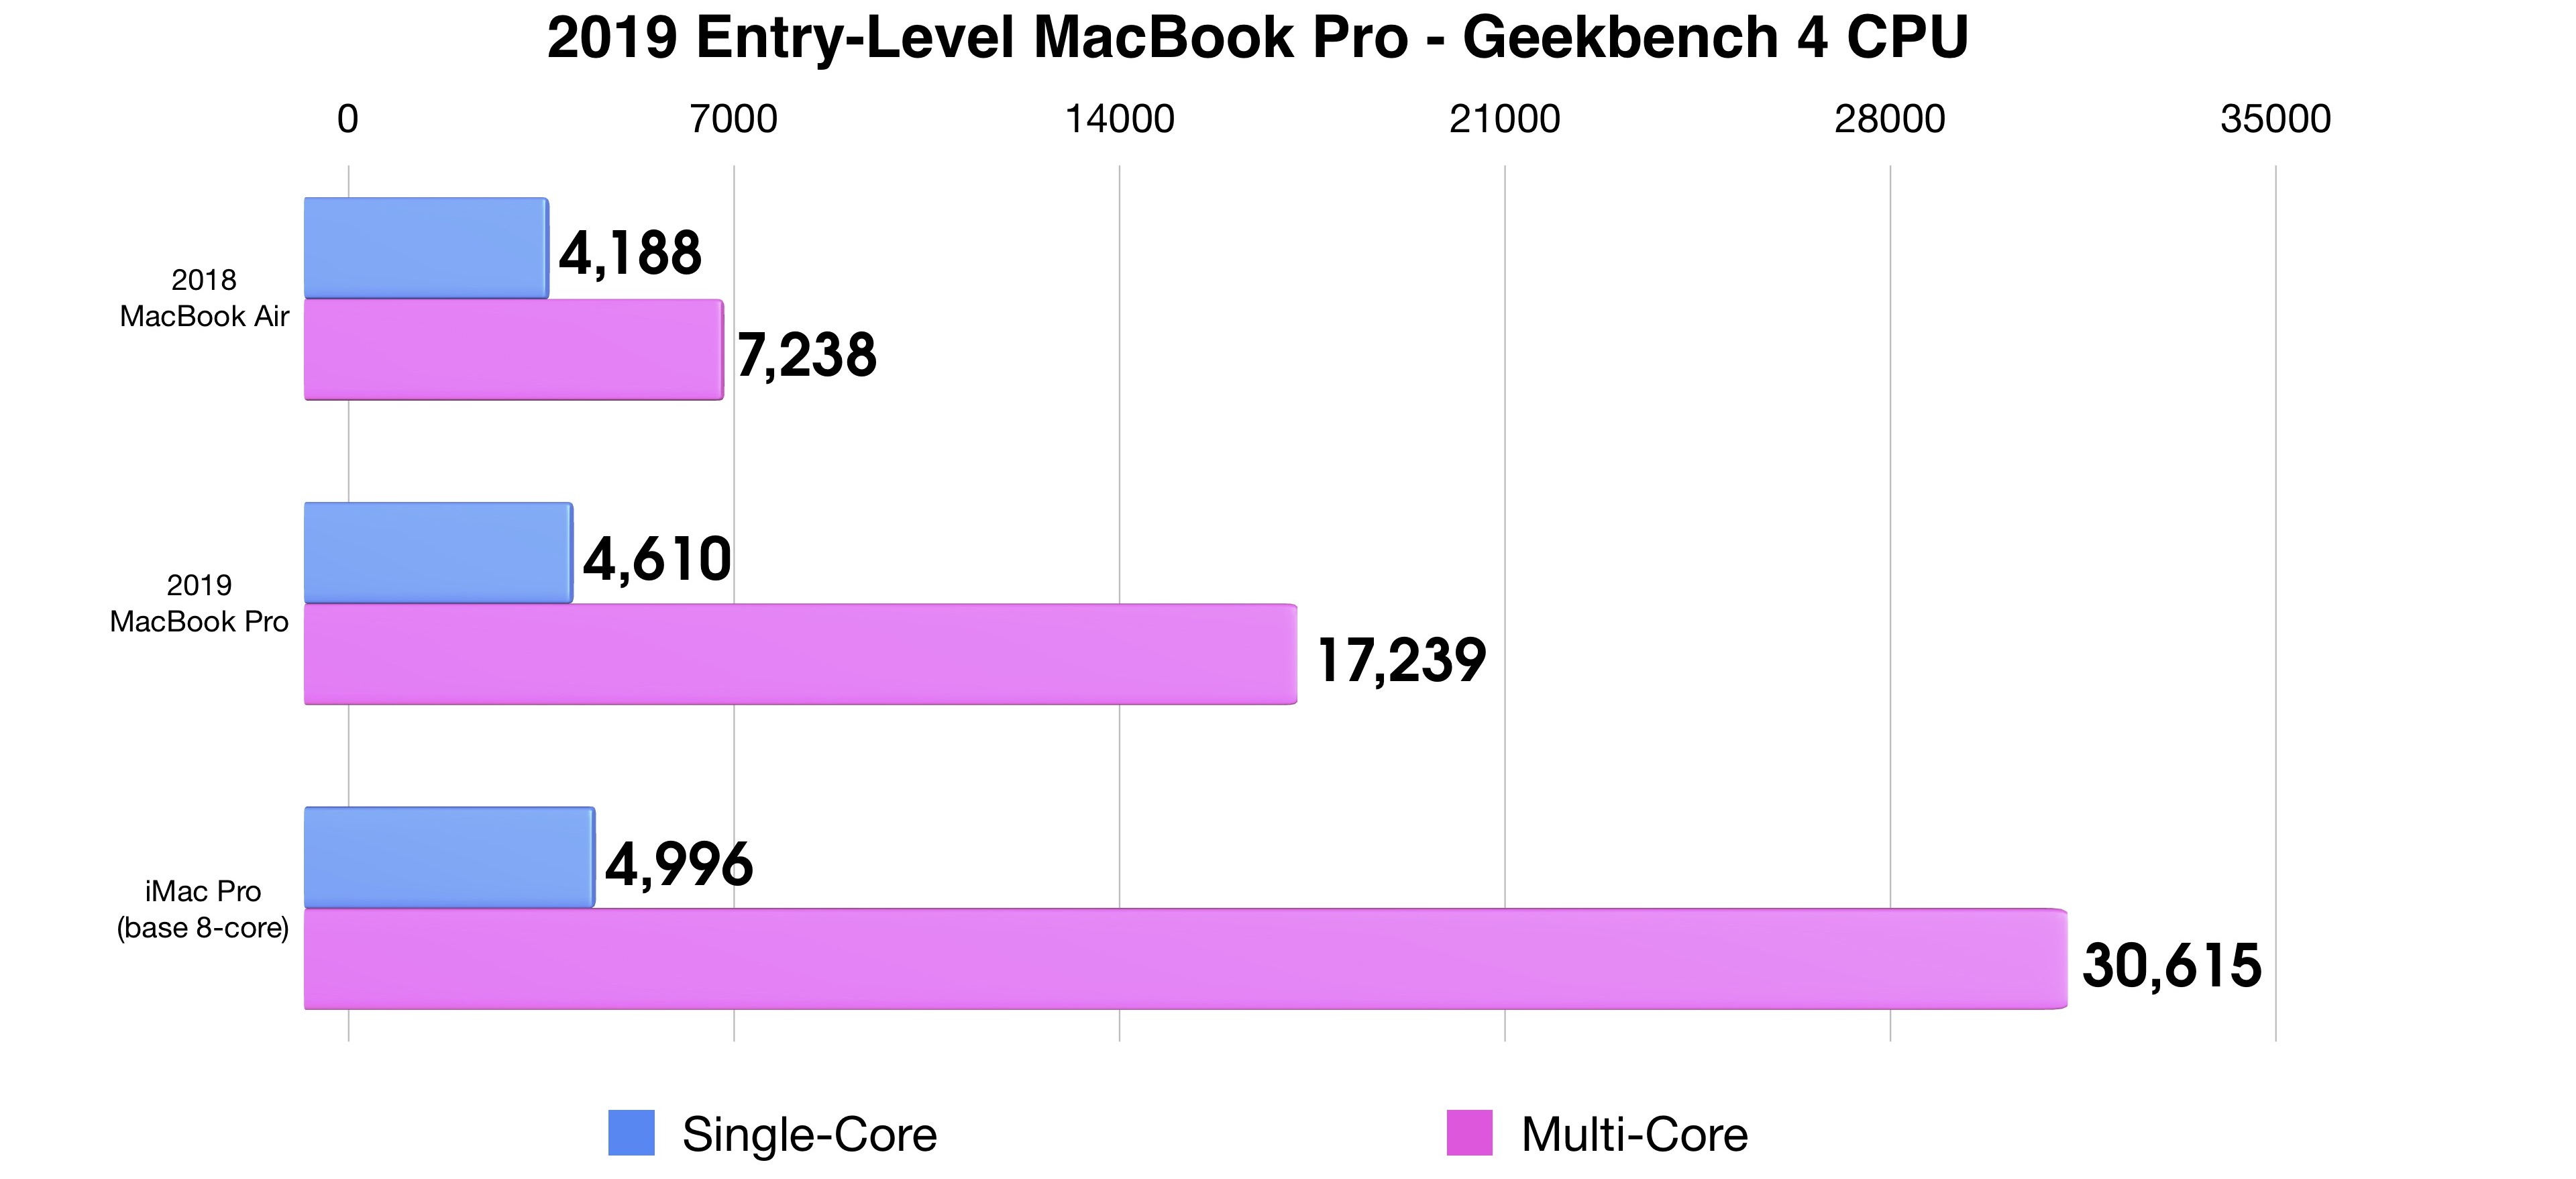 2019 MacBook Pro Geekbench Benchmark